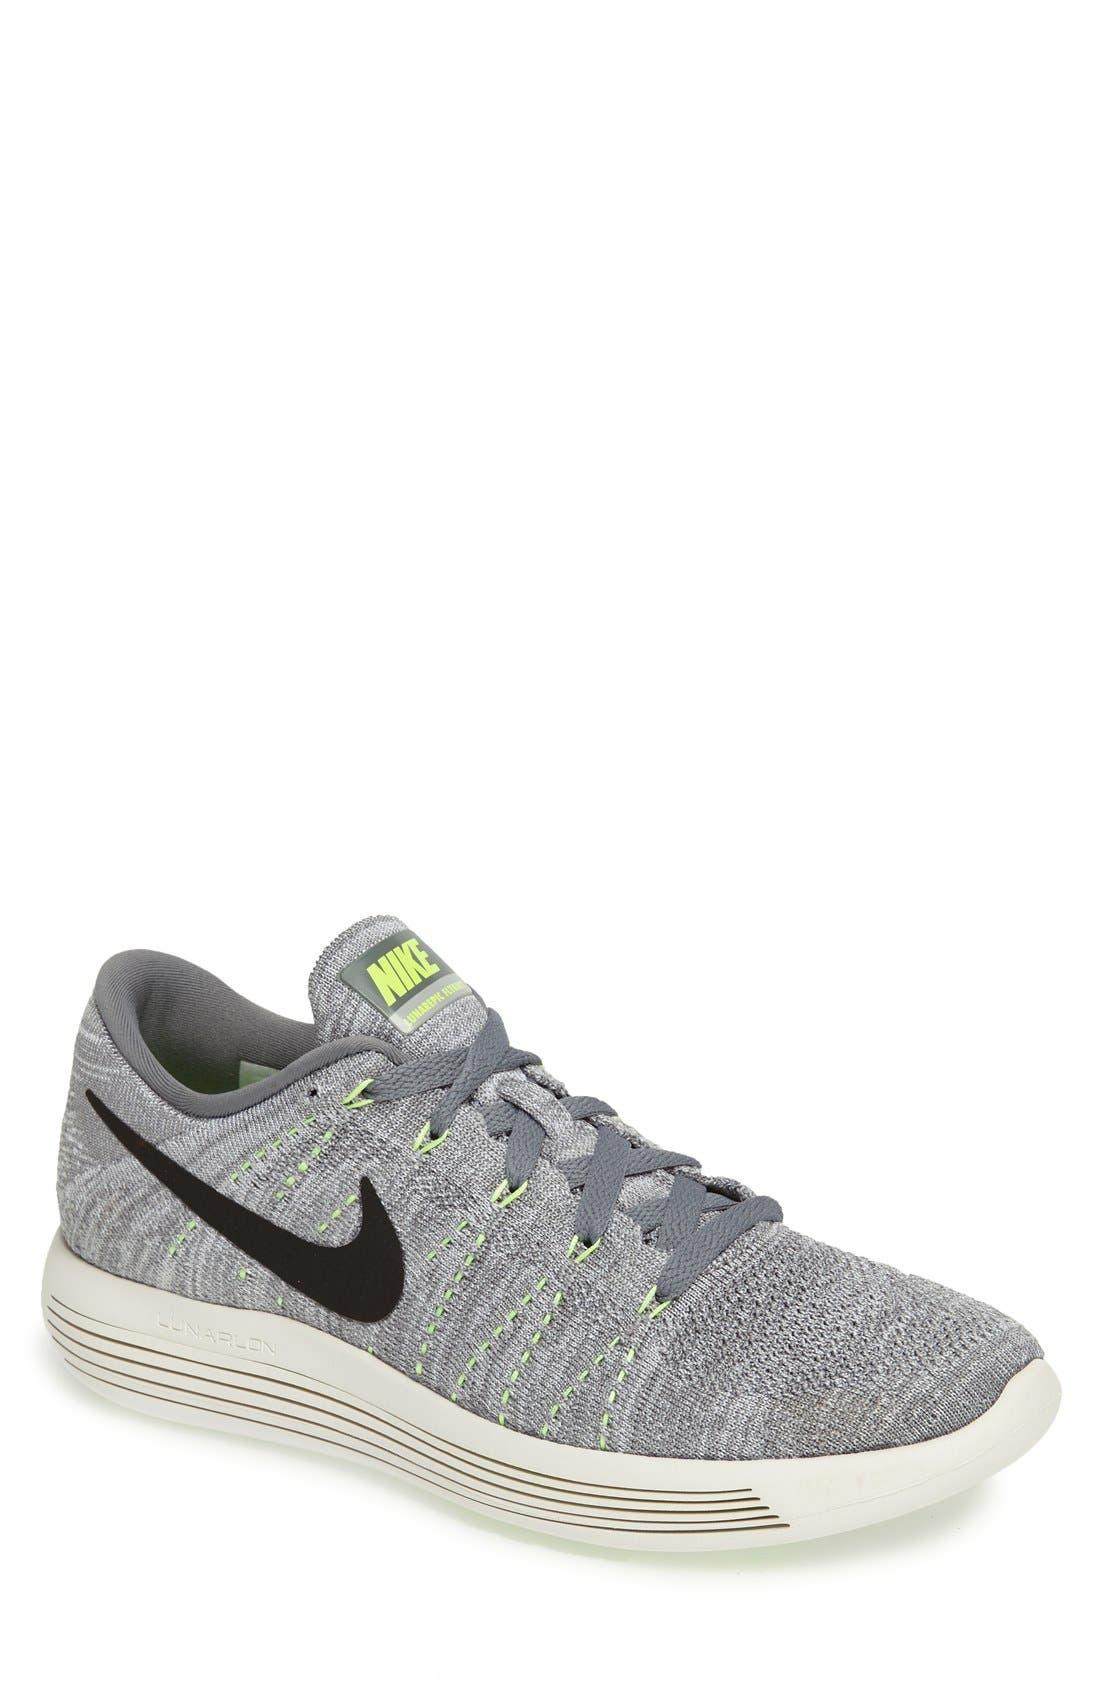 Alternate Image 1 Selected - Nike 'LunarEpic Low Flyknit' Running Shoe (Men)